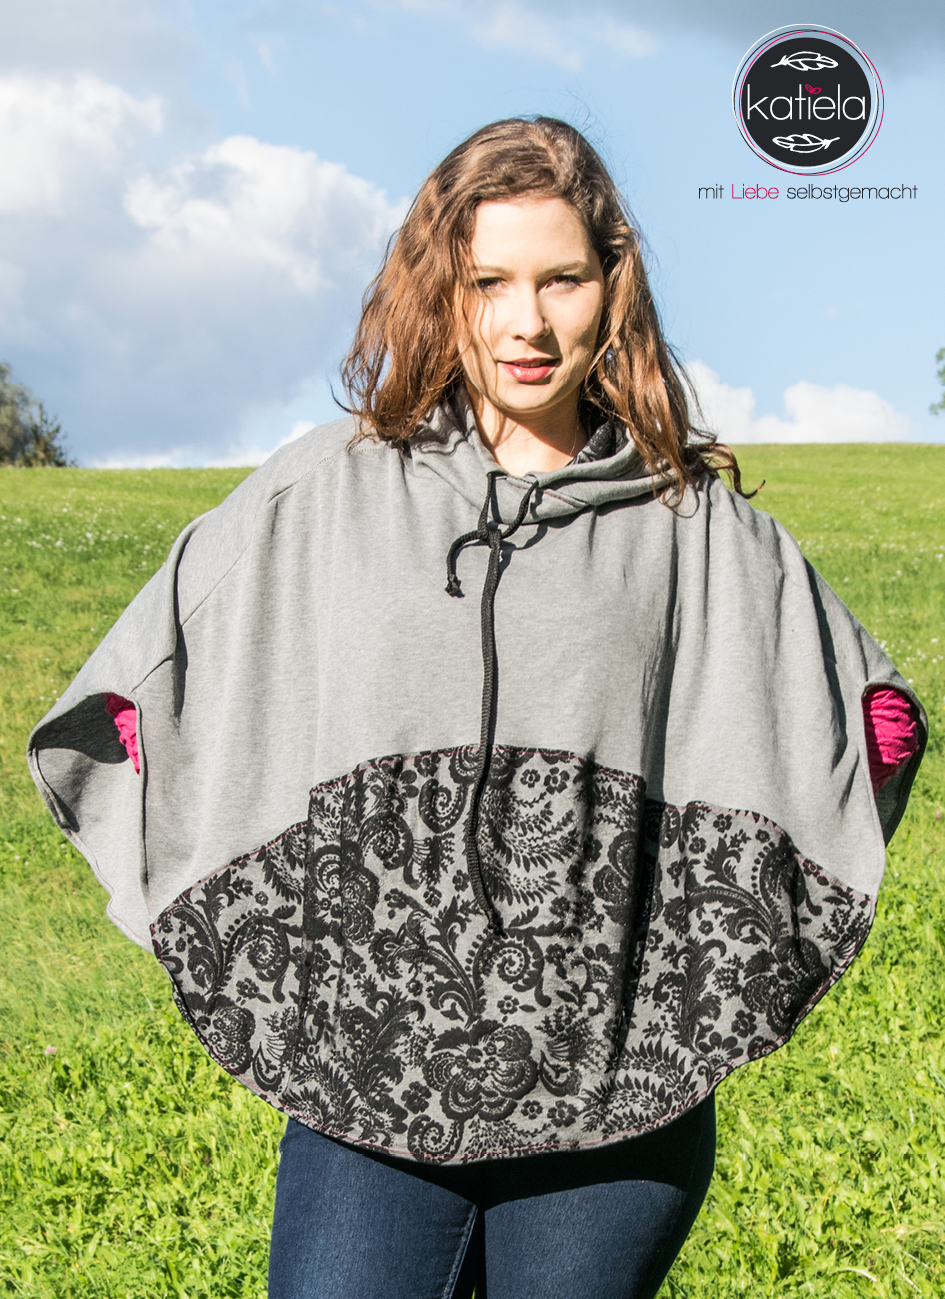 Windfangponcho - Flashback - Katiela